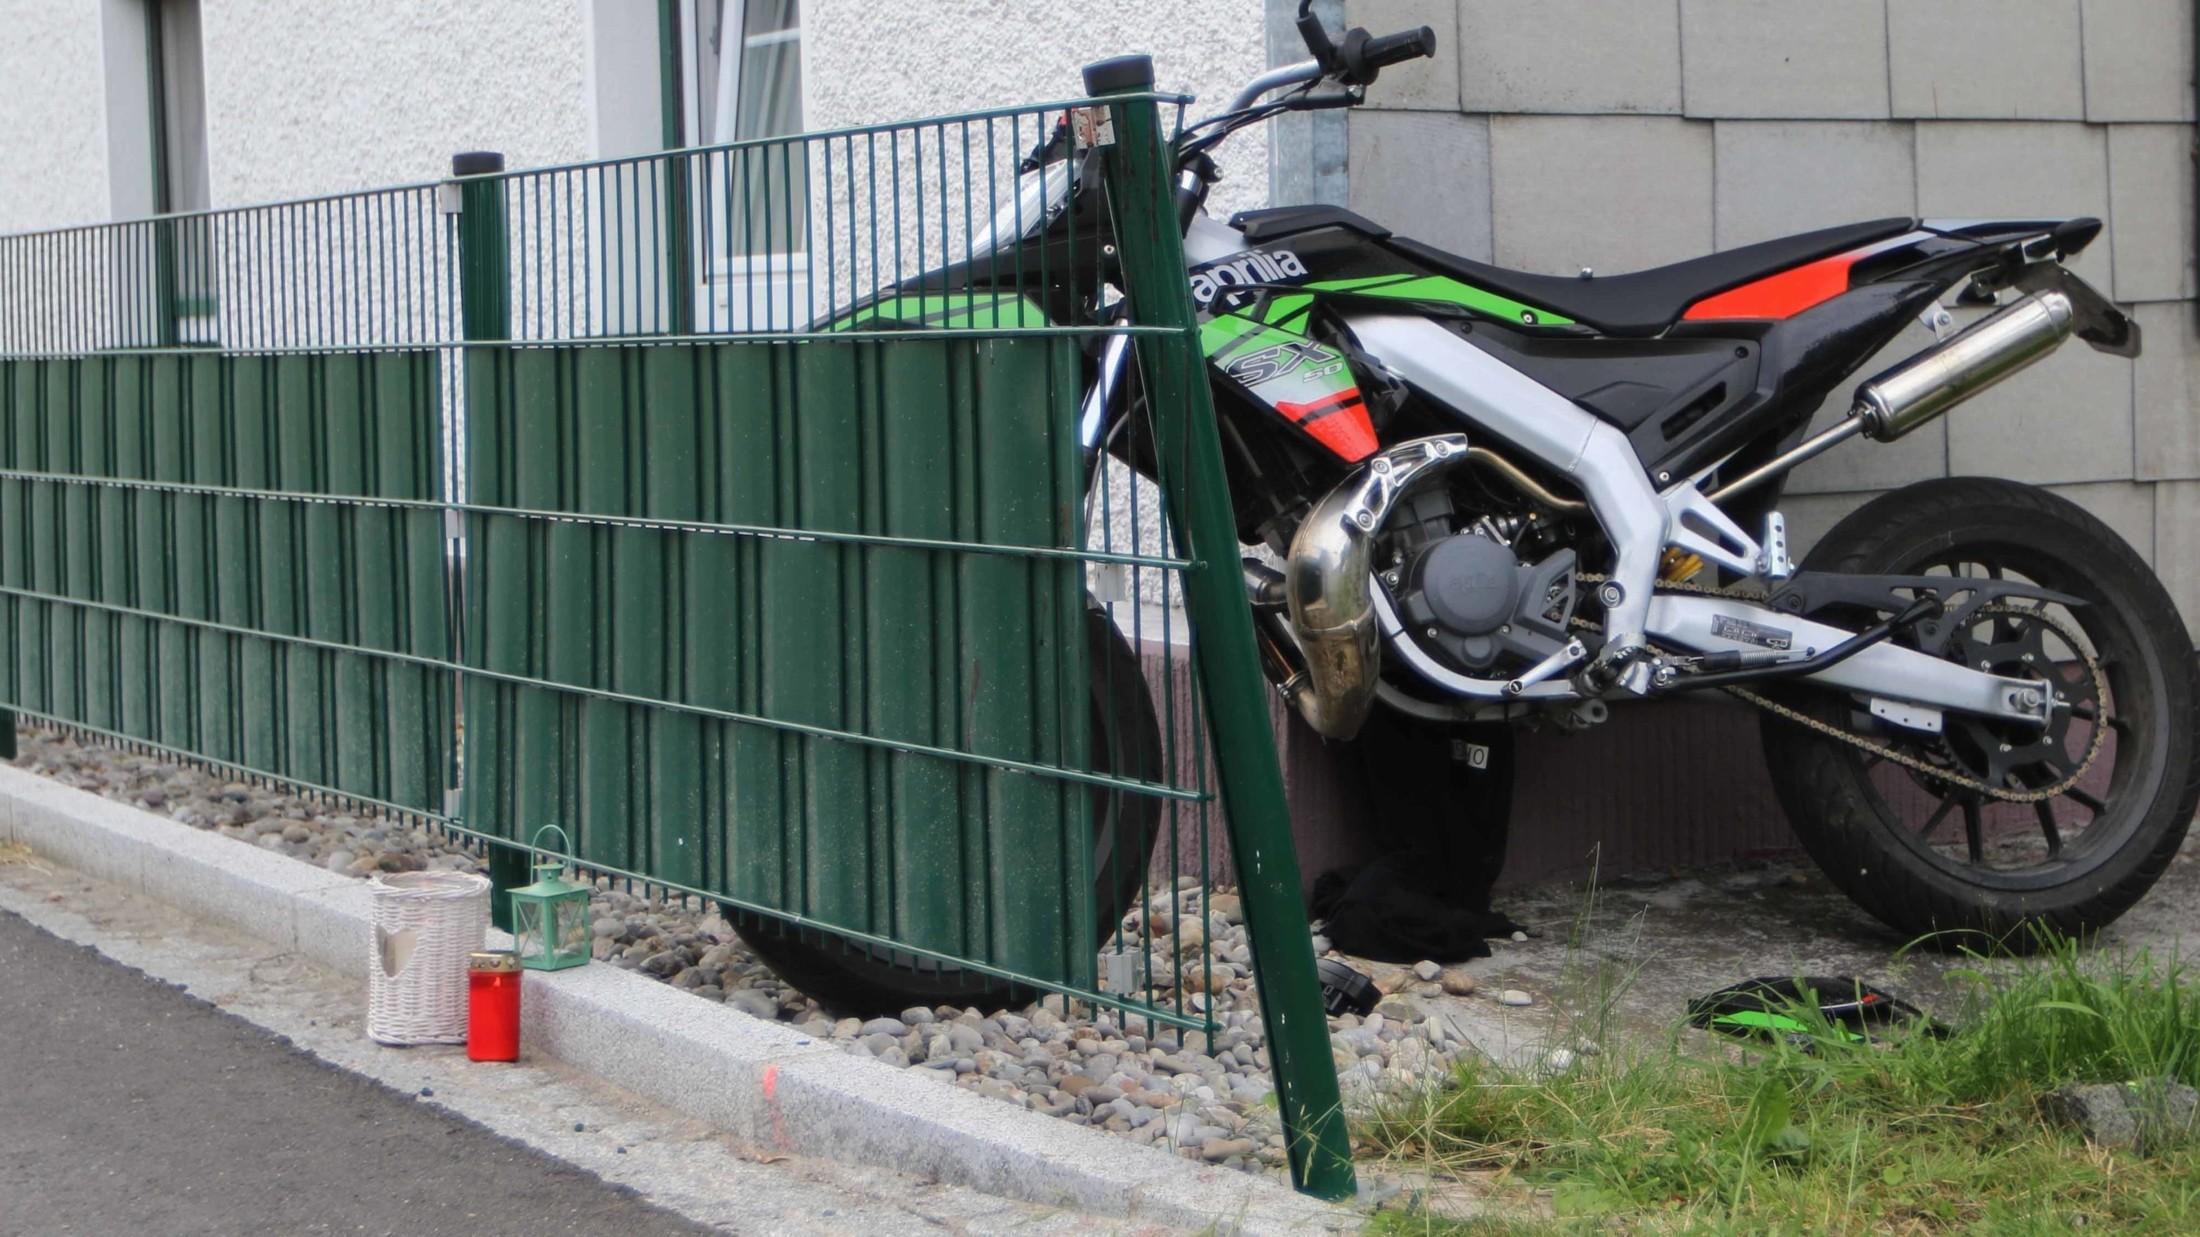 Kontrolle Verloren Teenager 15 Prallt Mit Moped Gegen Zaun Tot Krone At